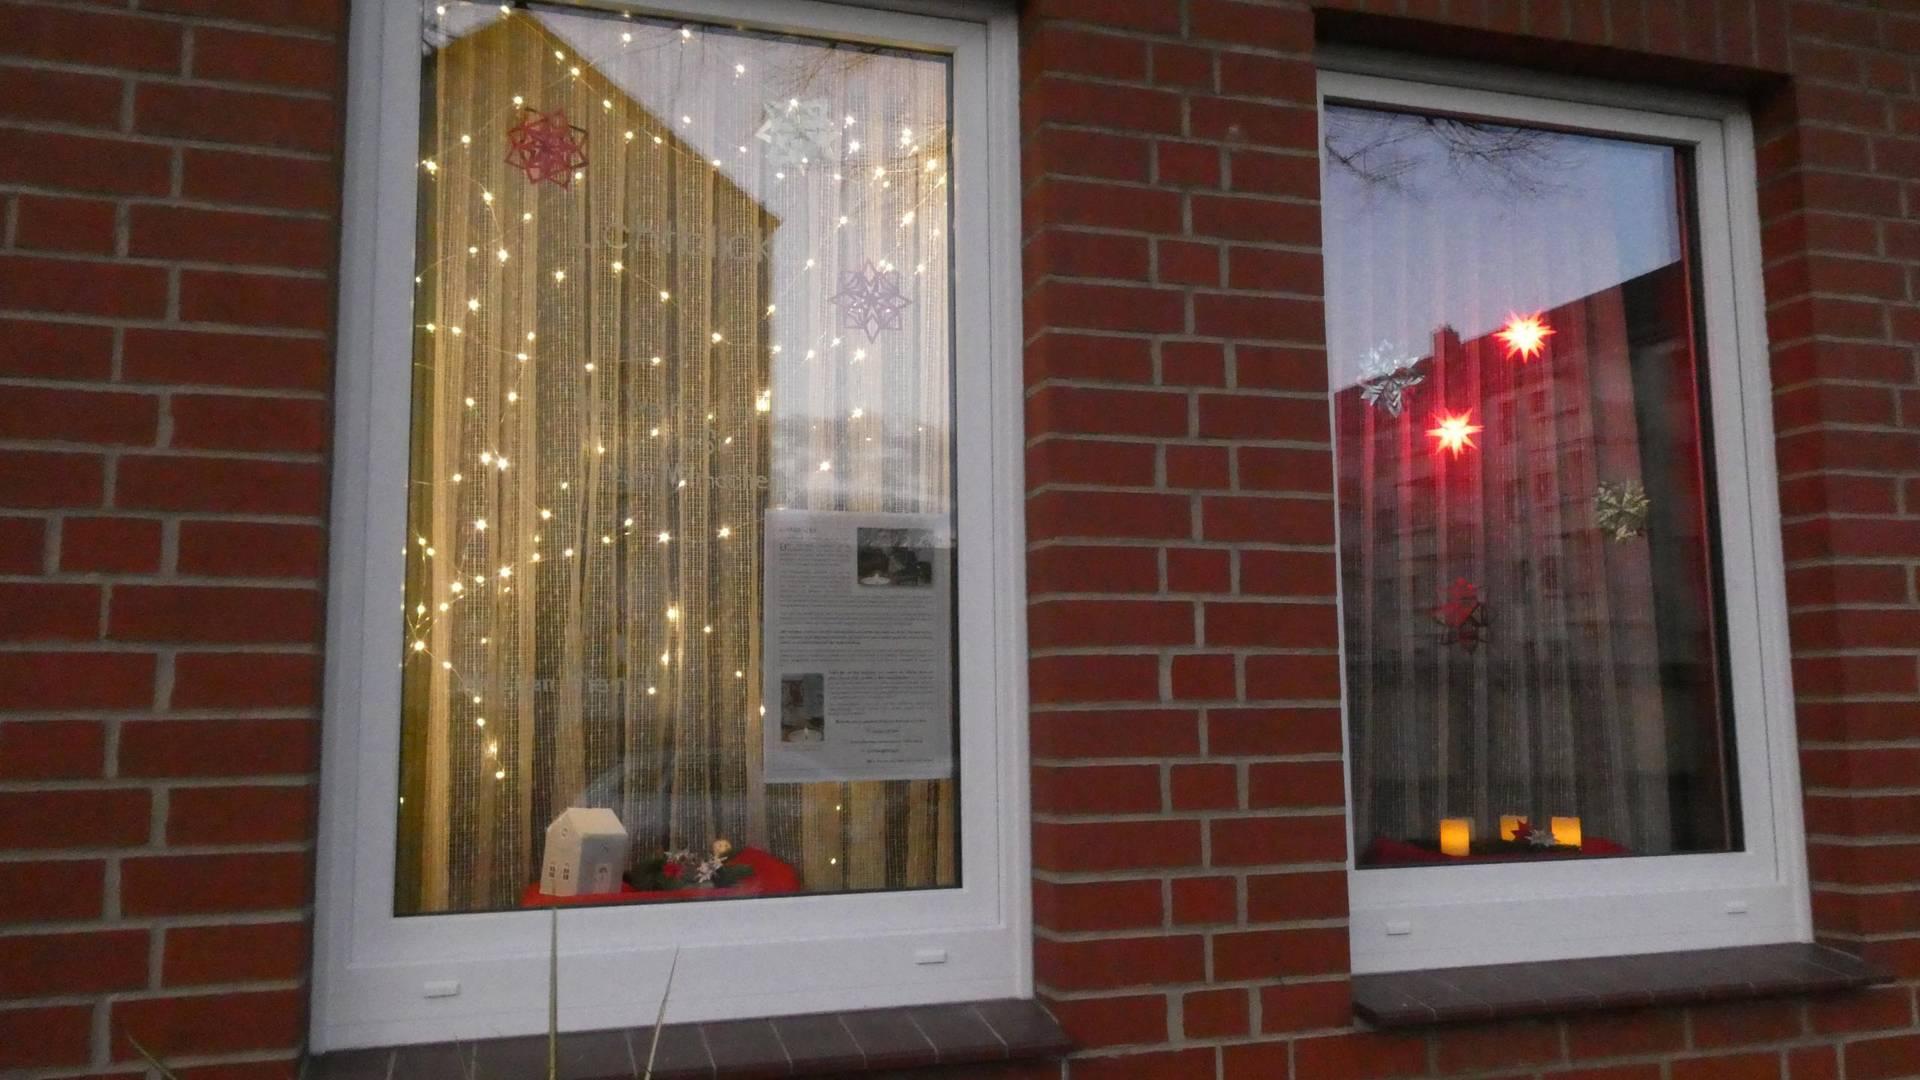 Beleuchtete Fenster der Begegnungsstätte © N. Francksen